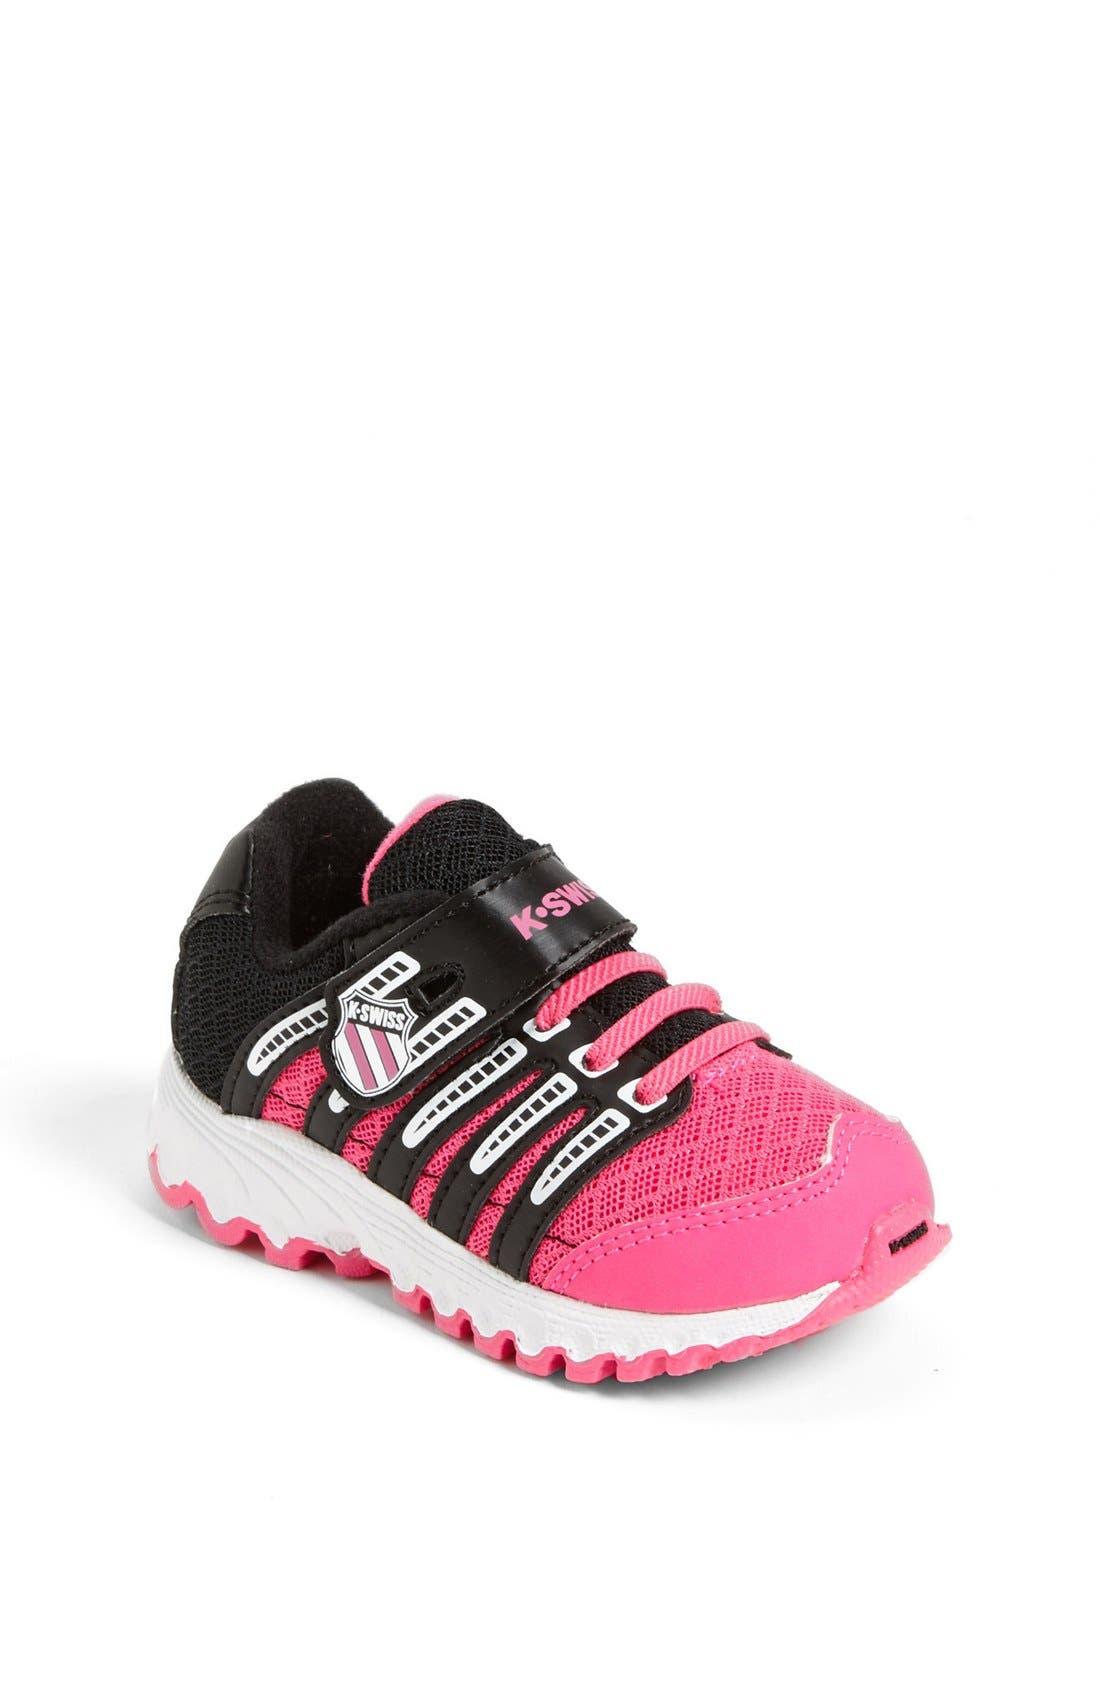 Alternate Image 1 Selected - K-Swiss 'Tubes Run 100' Sneaker (Baby, Walker & Toddler)